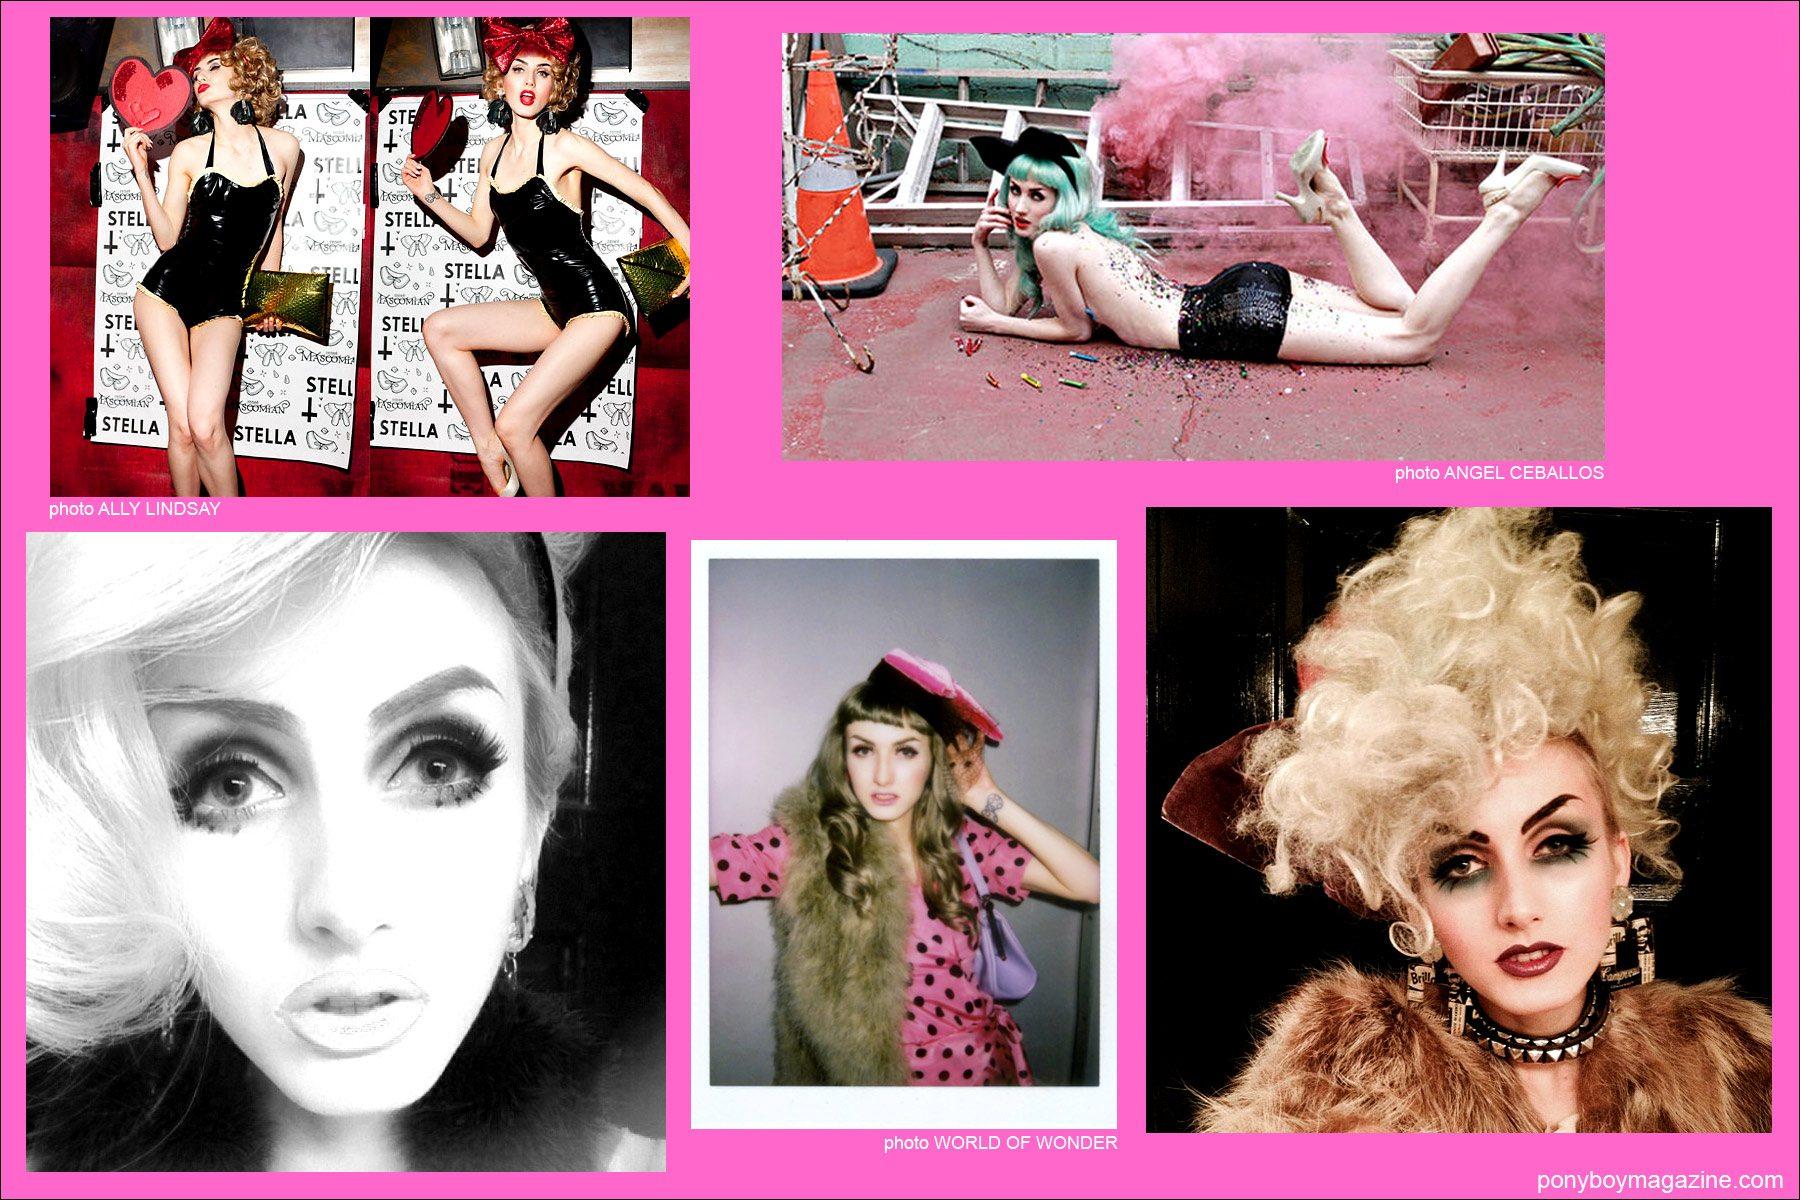 Photos of model and blogger Stella Rose Saint Clair for Ponyboy Magazine New York City.